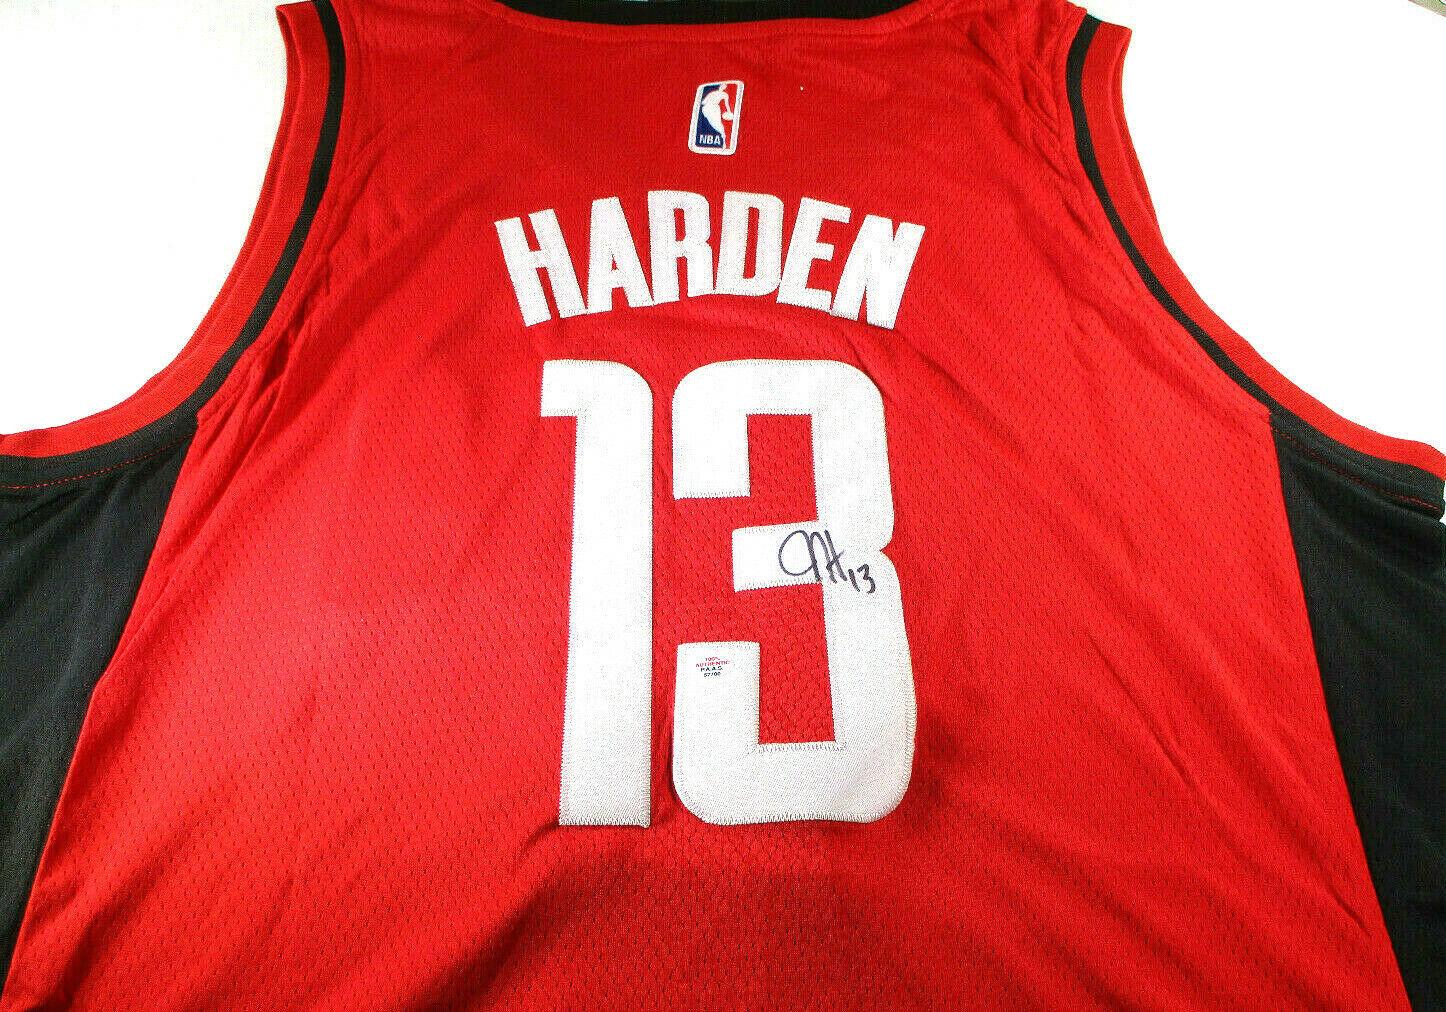 JAMES HARDEN / AUTOGRAPHED HOUSTON ROCKETS RED PRO STYLE BASKETBALL JERSEY / COA